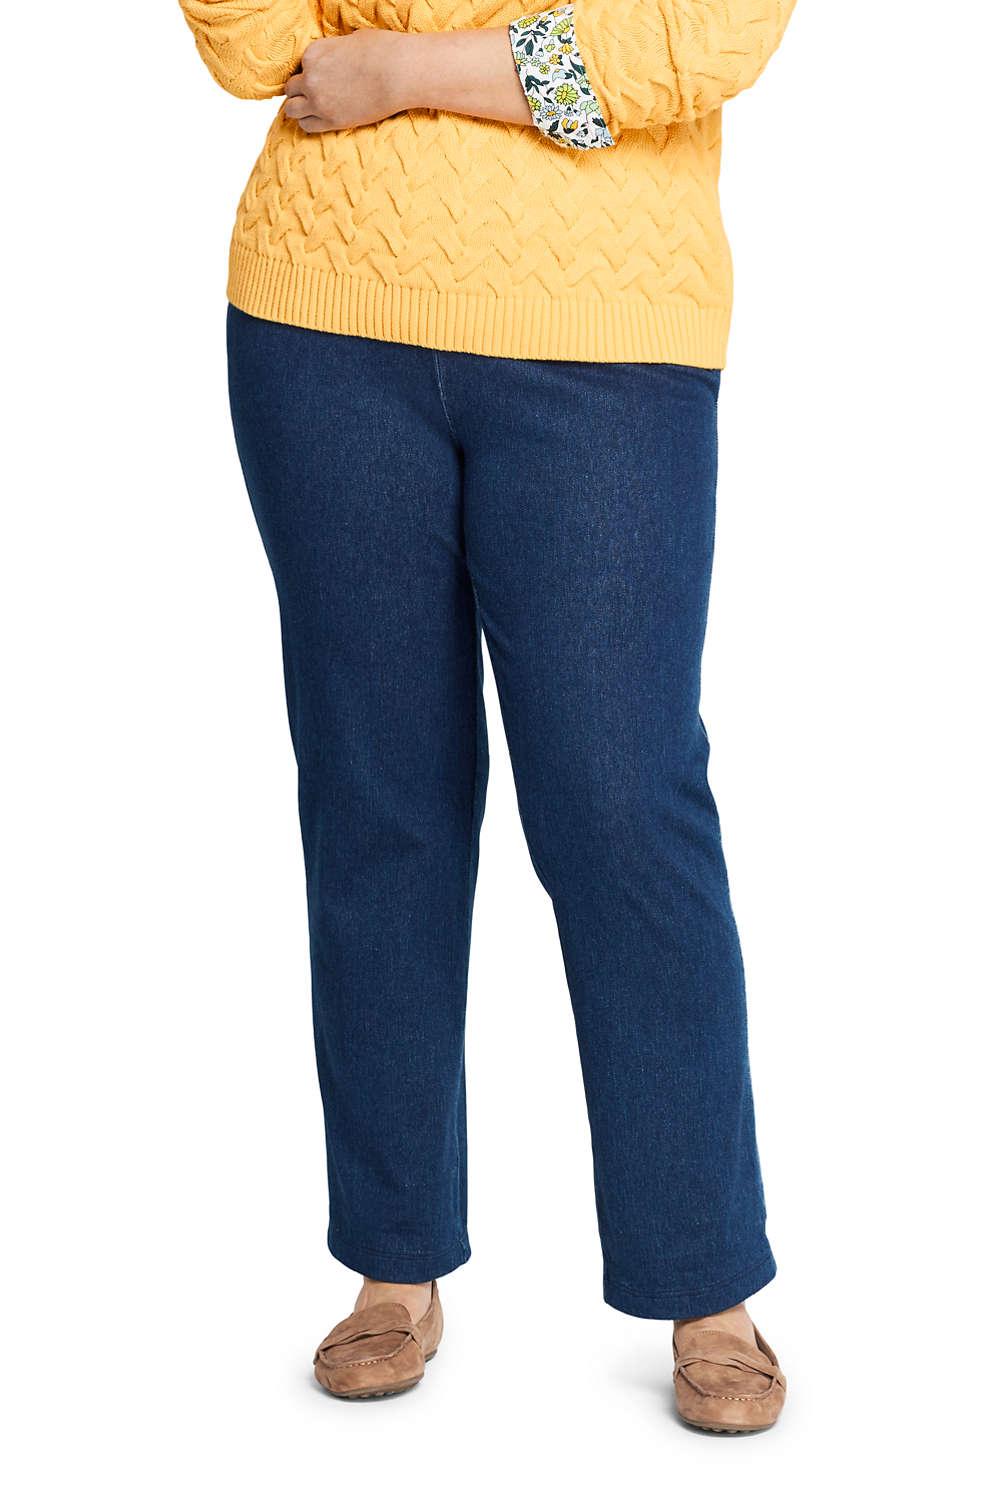 55460c3c7 Women's Plus Size Sport Knit Denim High Rise Elastic Waist Pull On ...